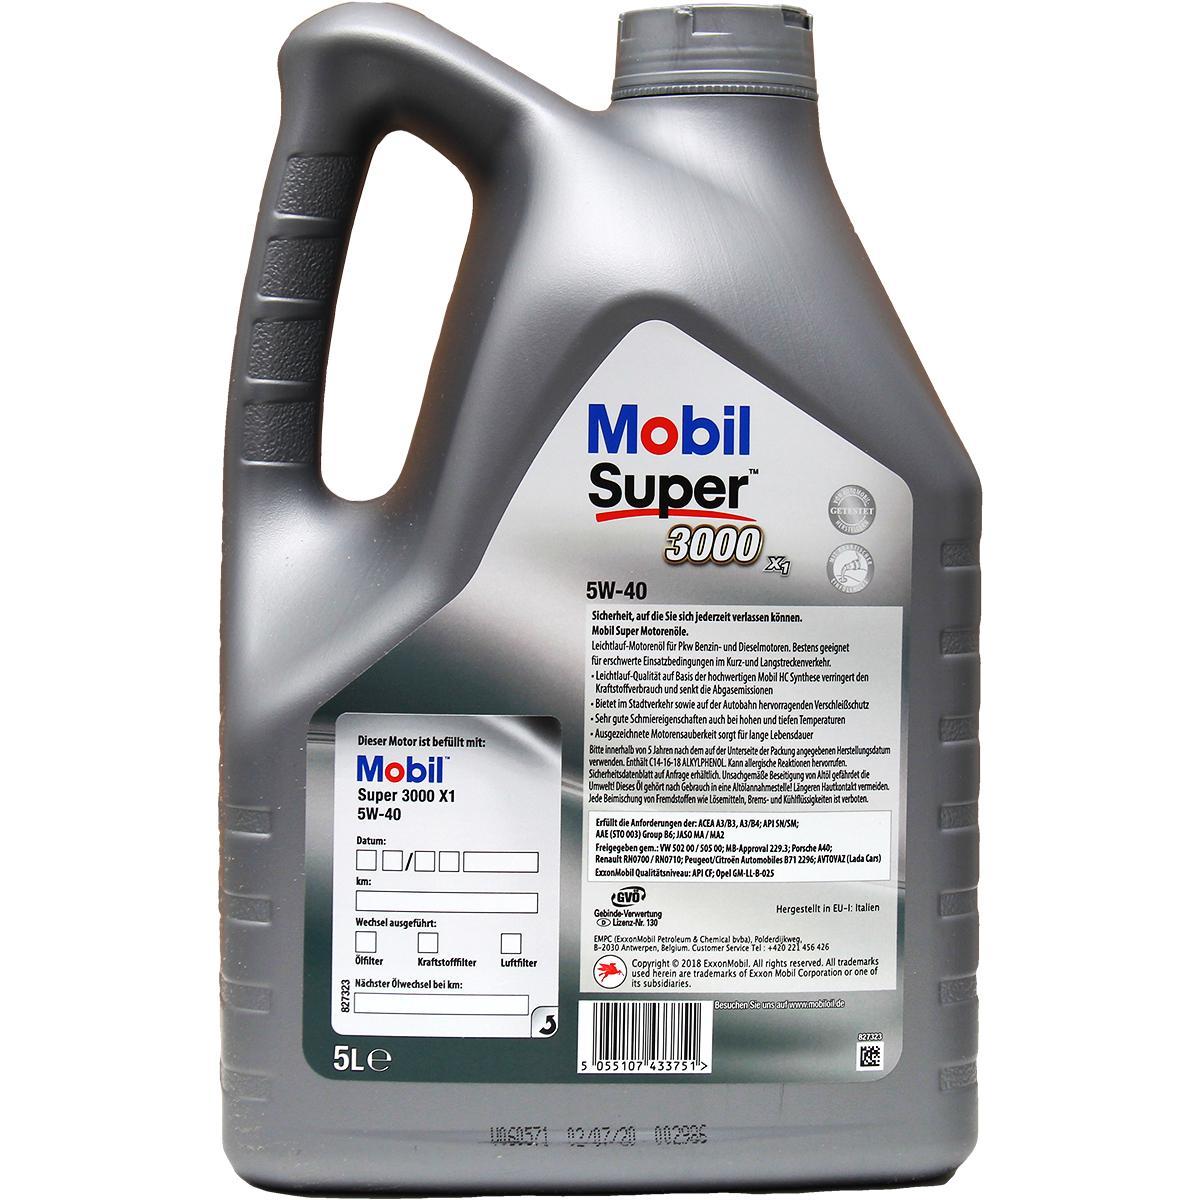 Engine Fluid MOBIL GMLLB25 rating